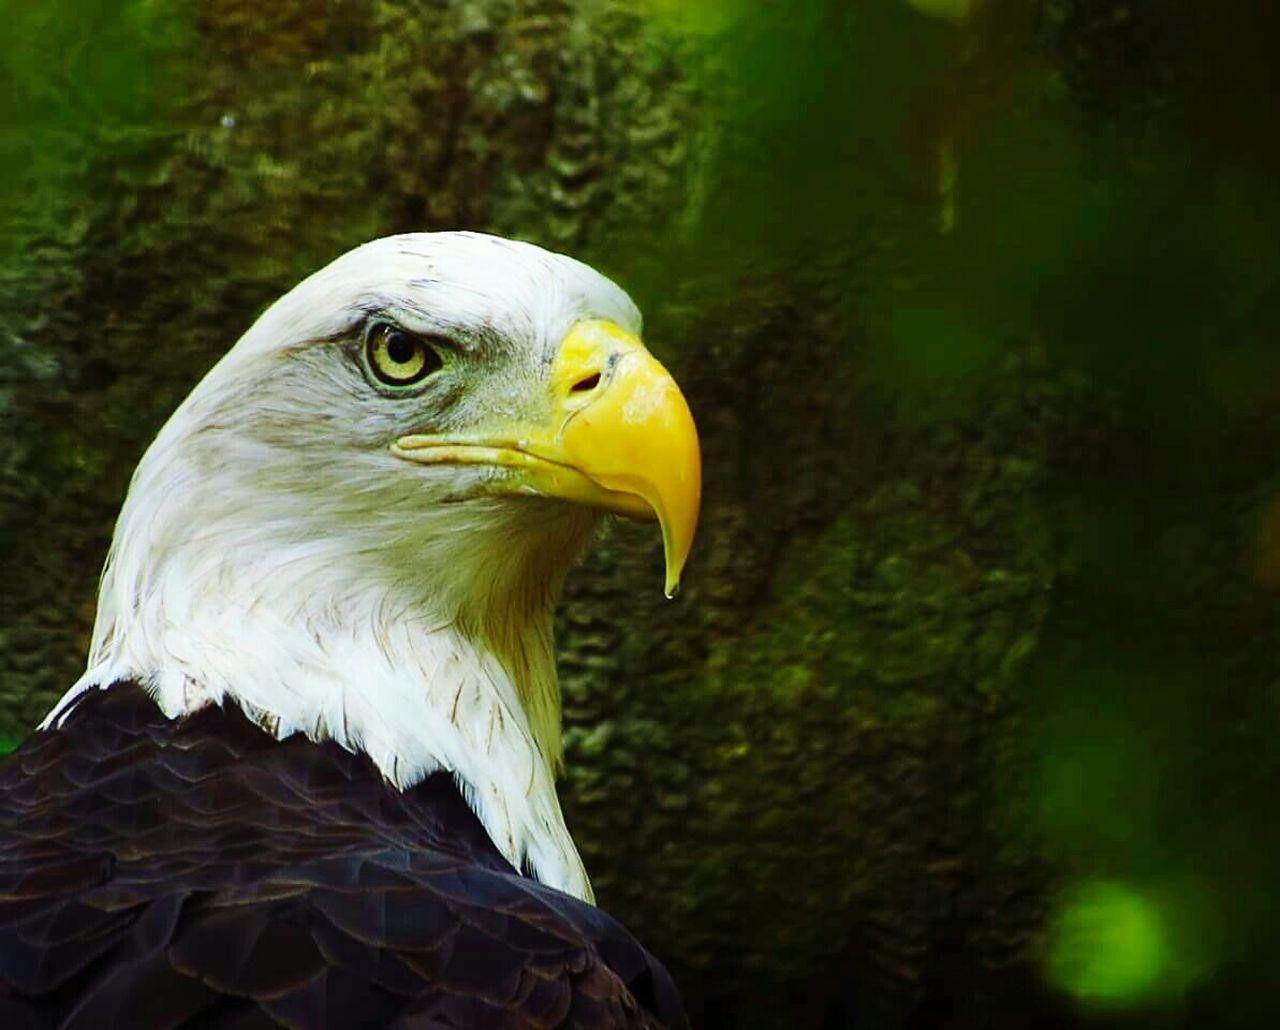 Beautiful stock photos of bald eagle, animal themes, bird, one animal, animals in the wild